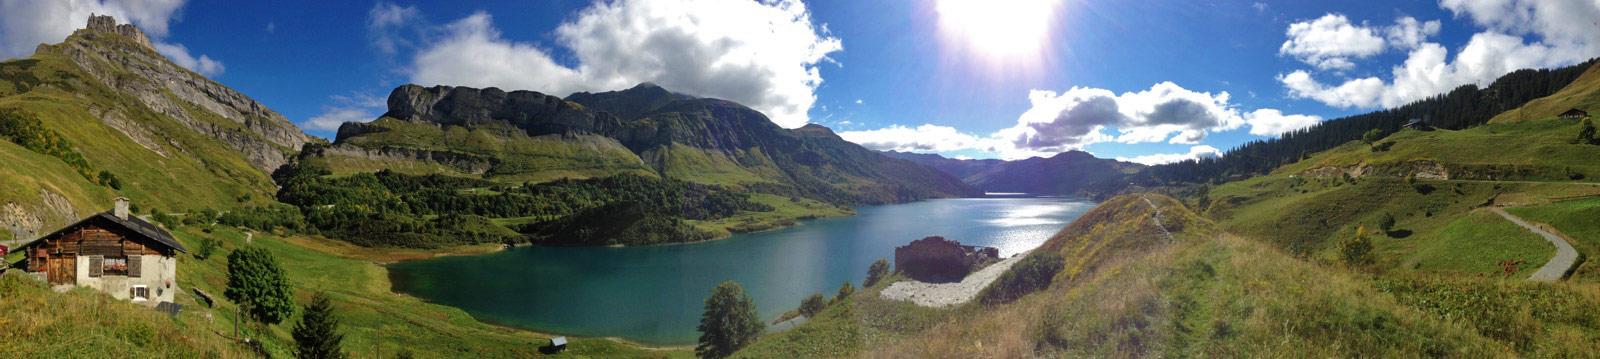 roselend-lake